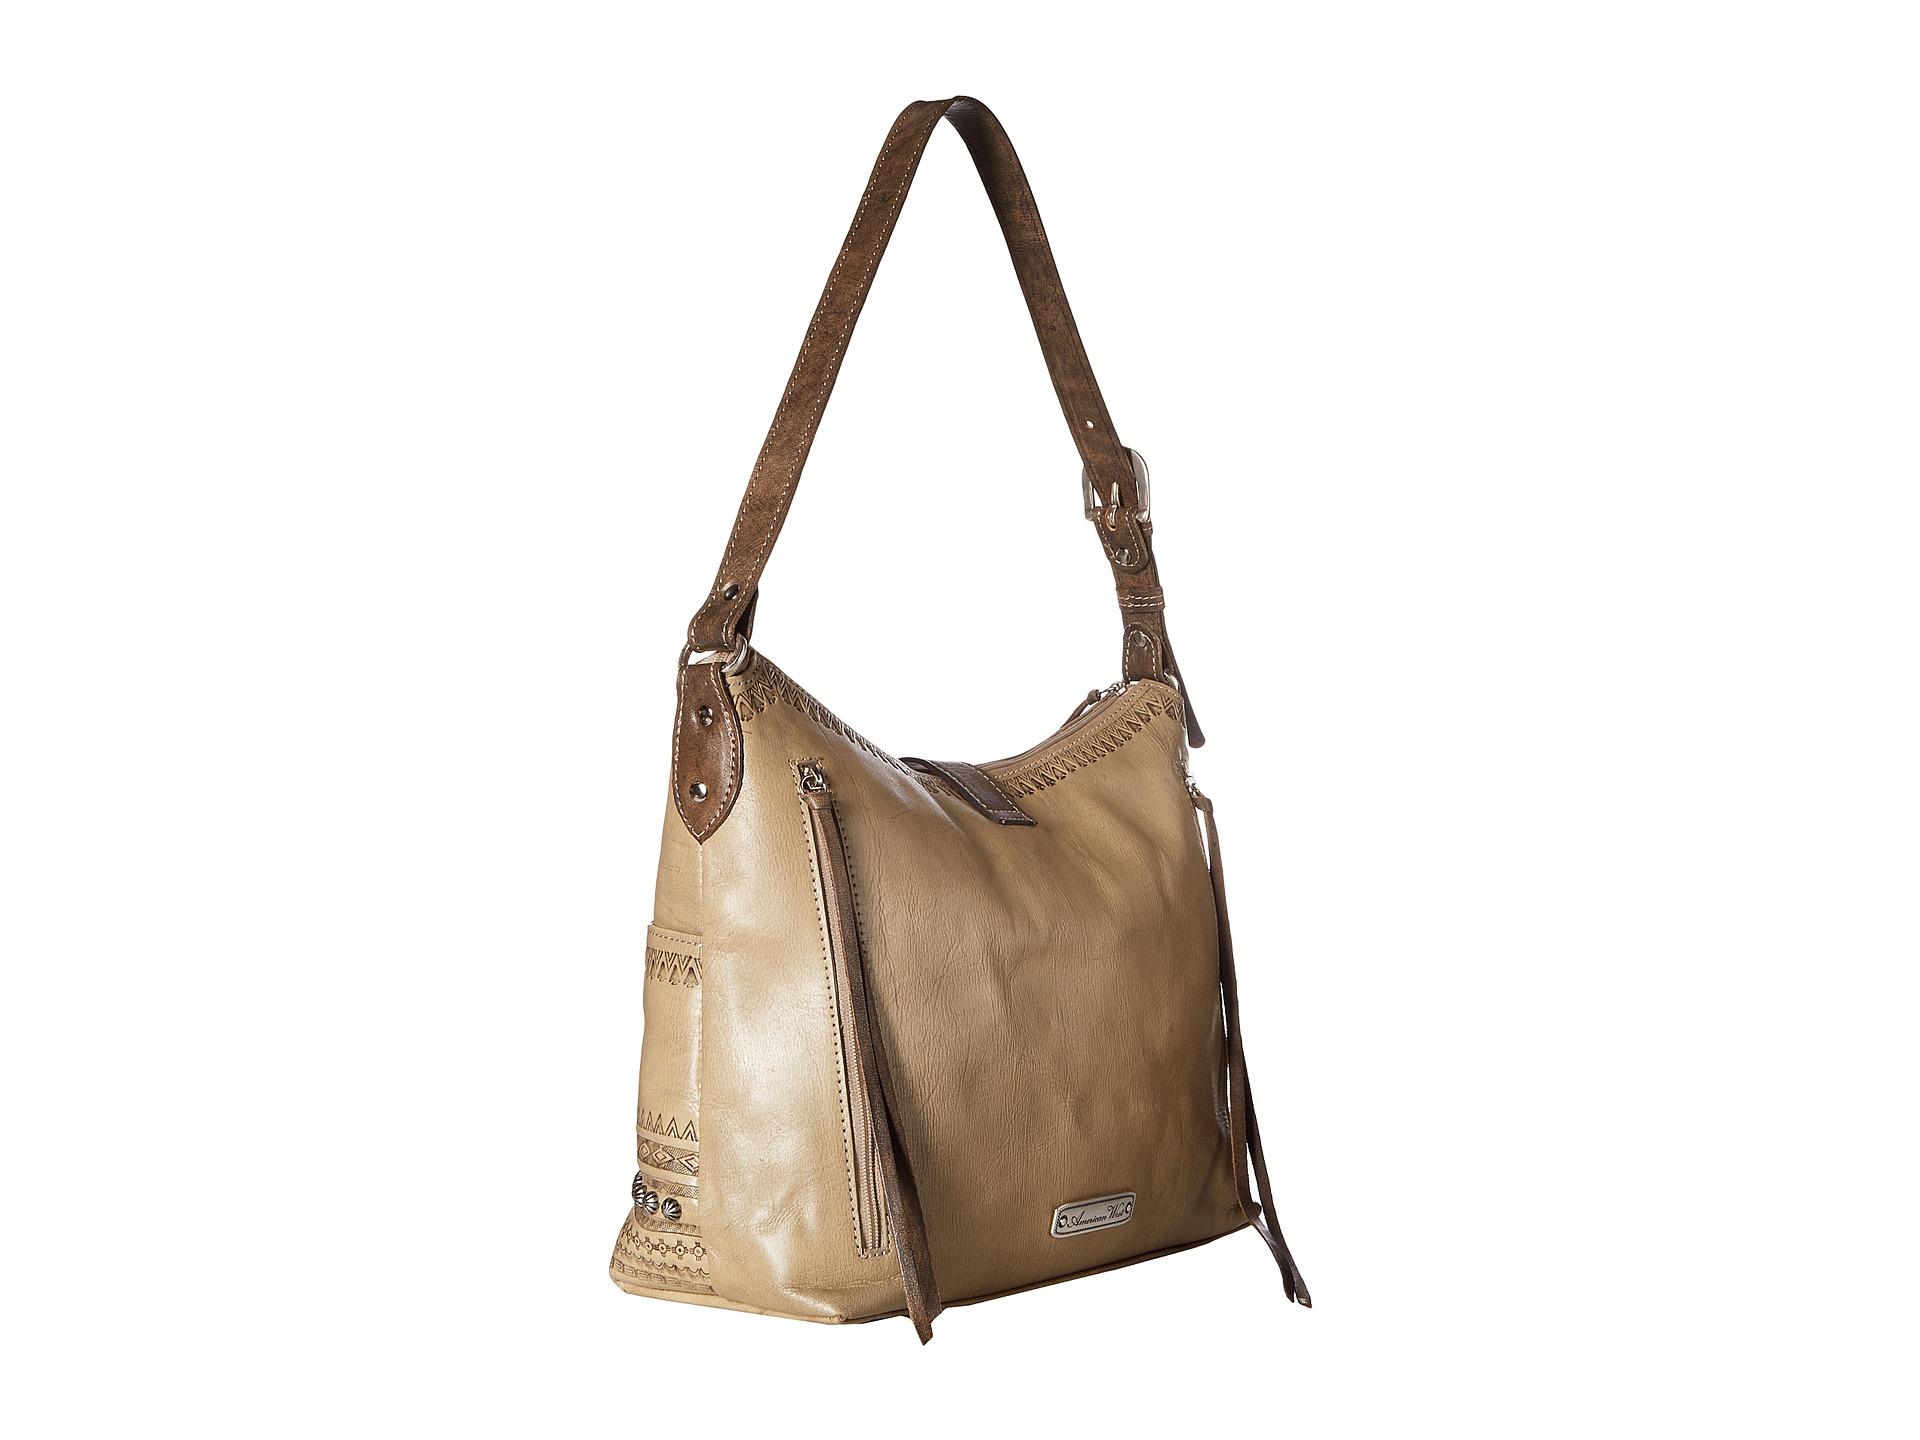 american west trading post large zip top shoulder bag